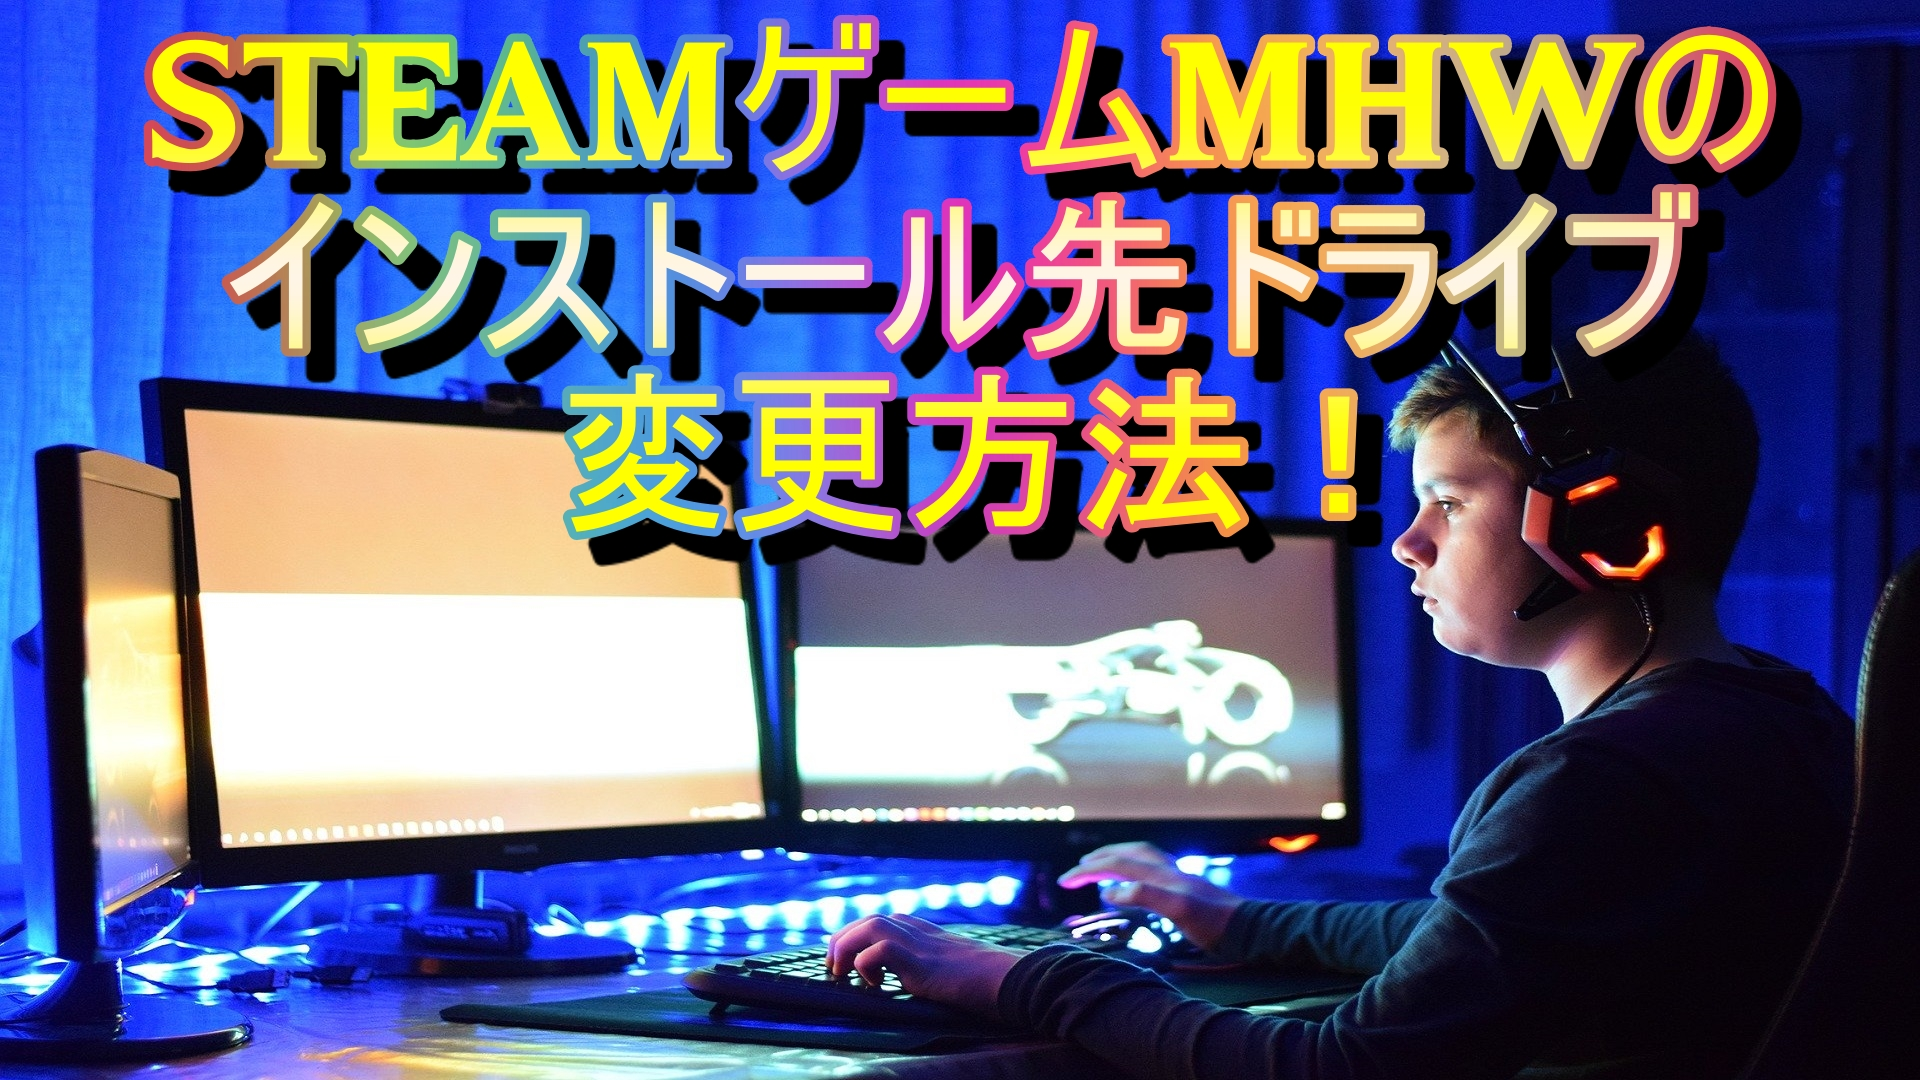 SteamゲームMHWのインストール先ドライブ変更&移動方法!